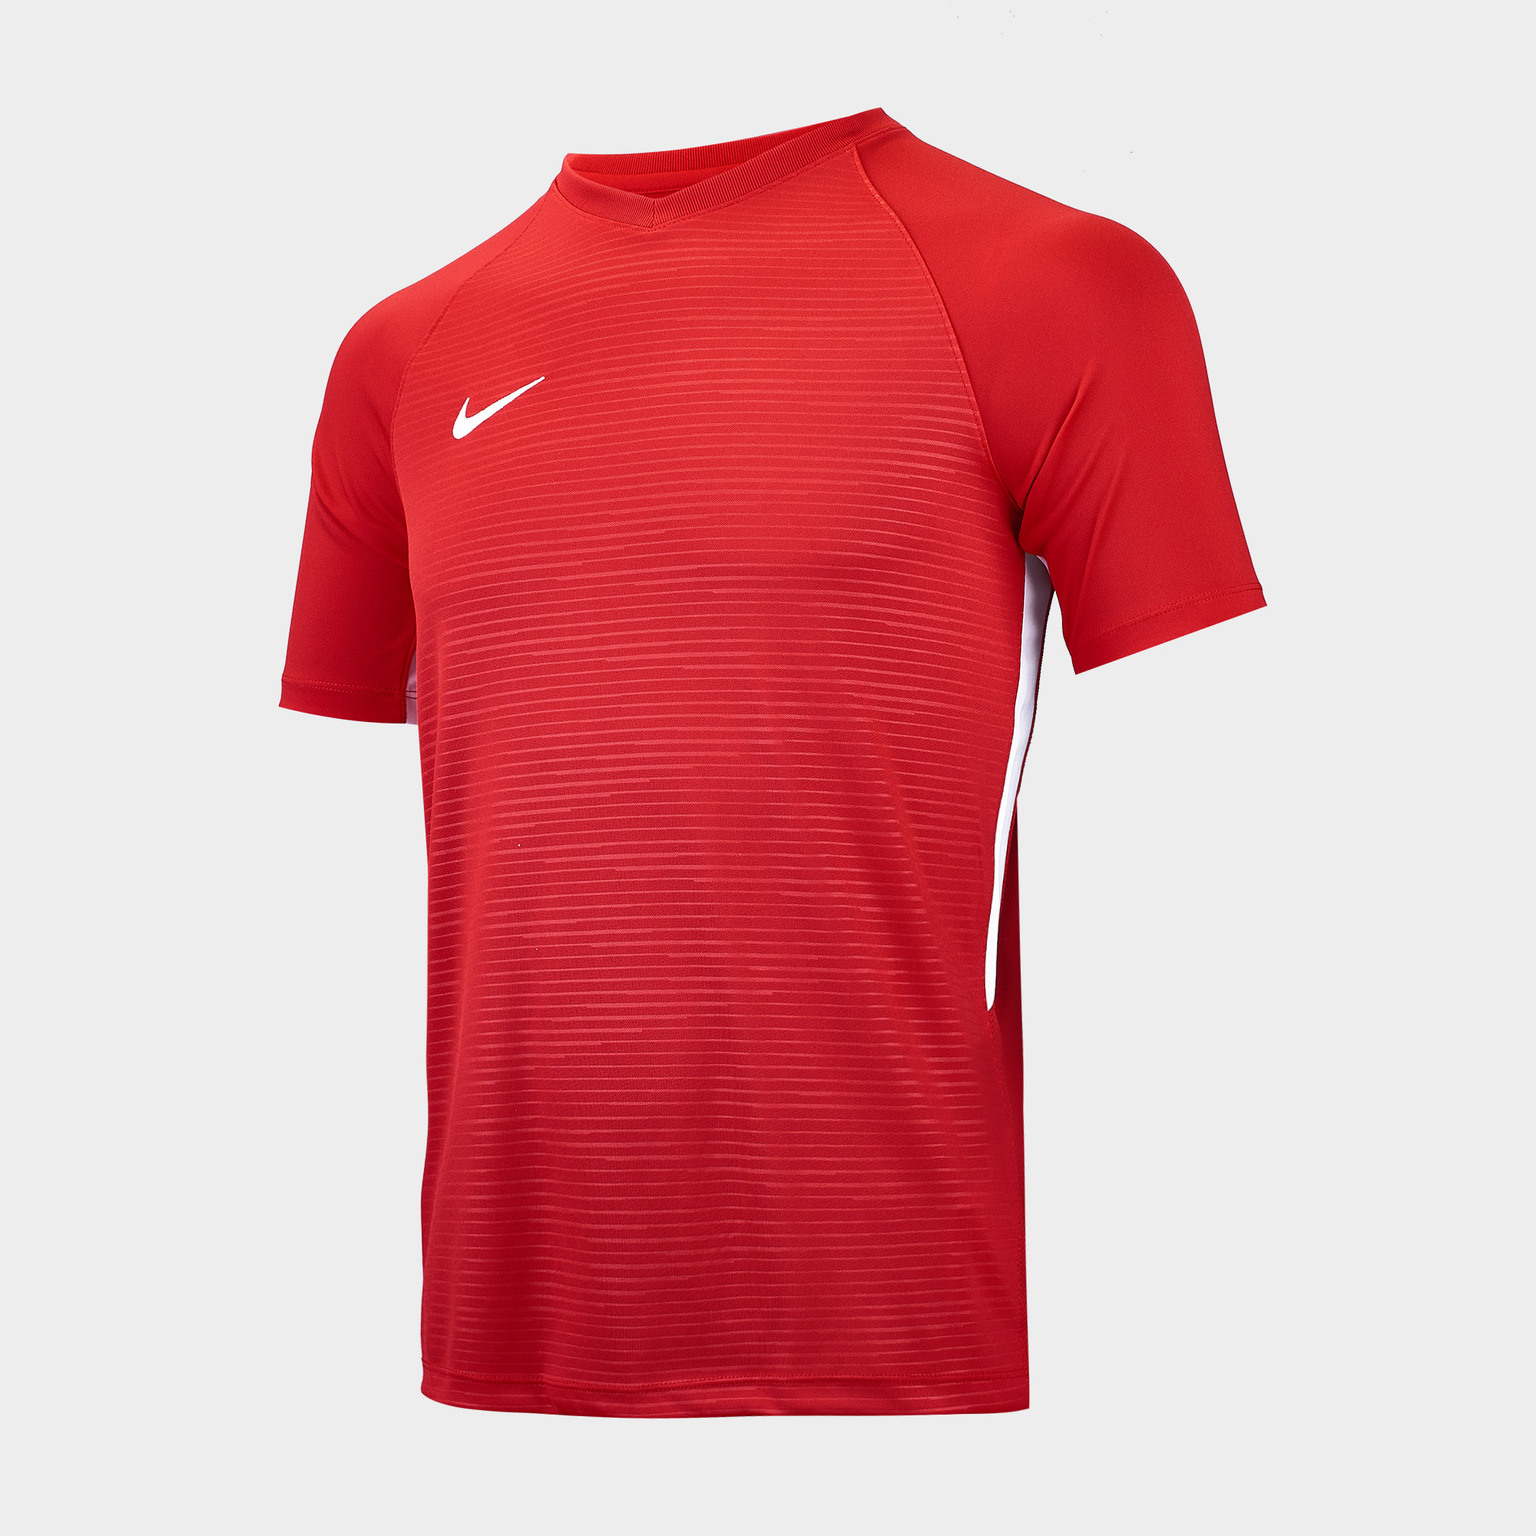 Футболка детская Nike Dry Tiempo Premier 894111-657 футболка игровая nike dry tiempo prem jsy ss 894230 411